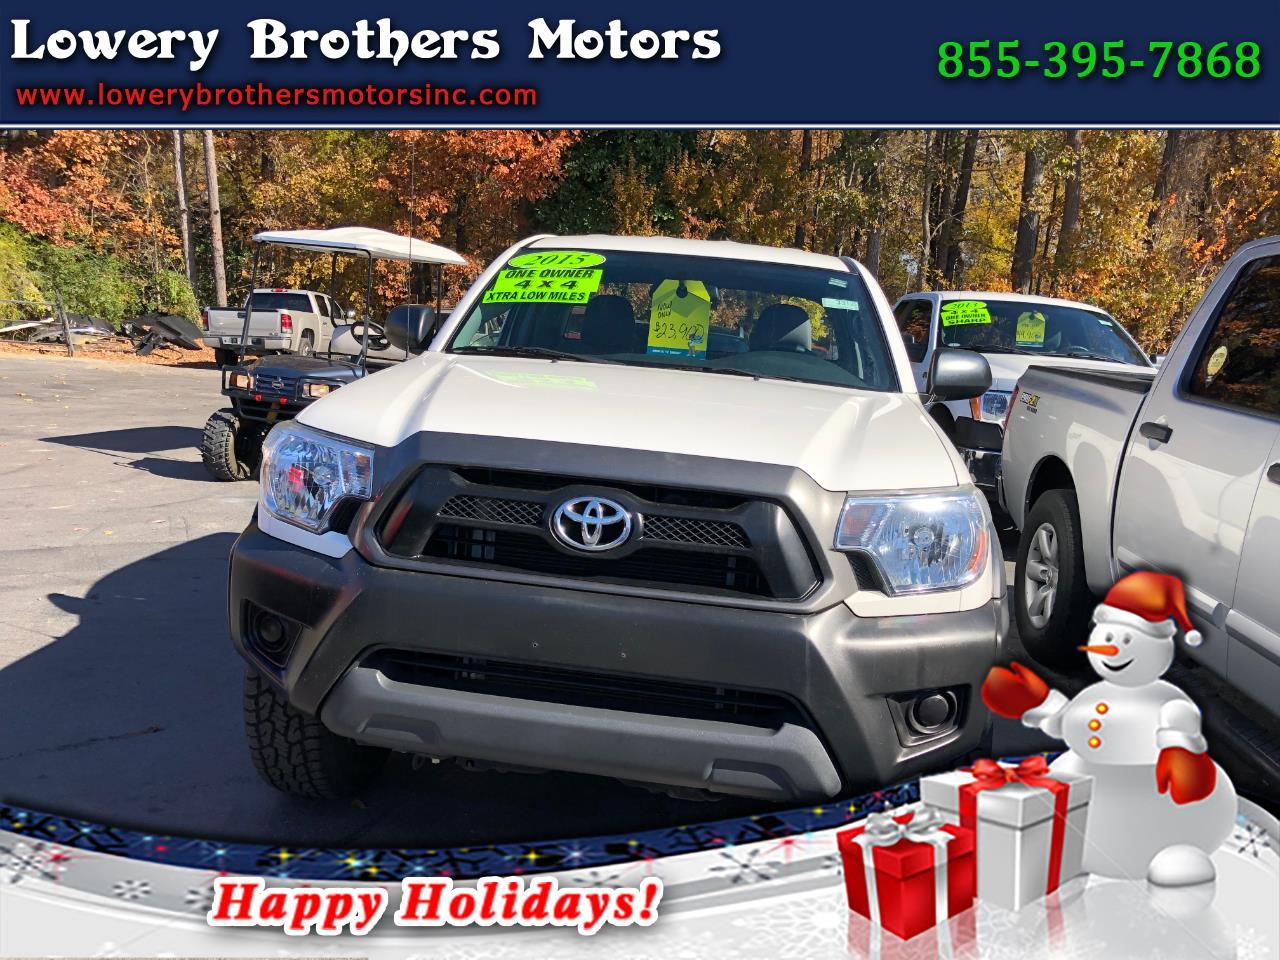 2015 Toyota Tacoma 4WD Access Cab V6 AT (Natl)